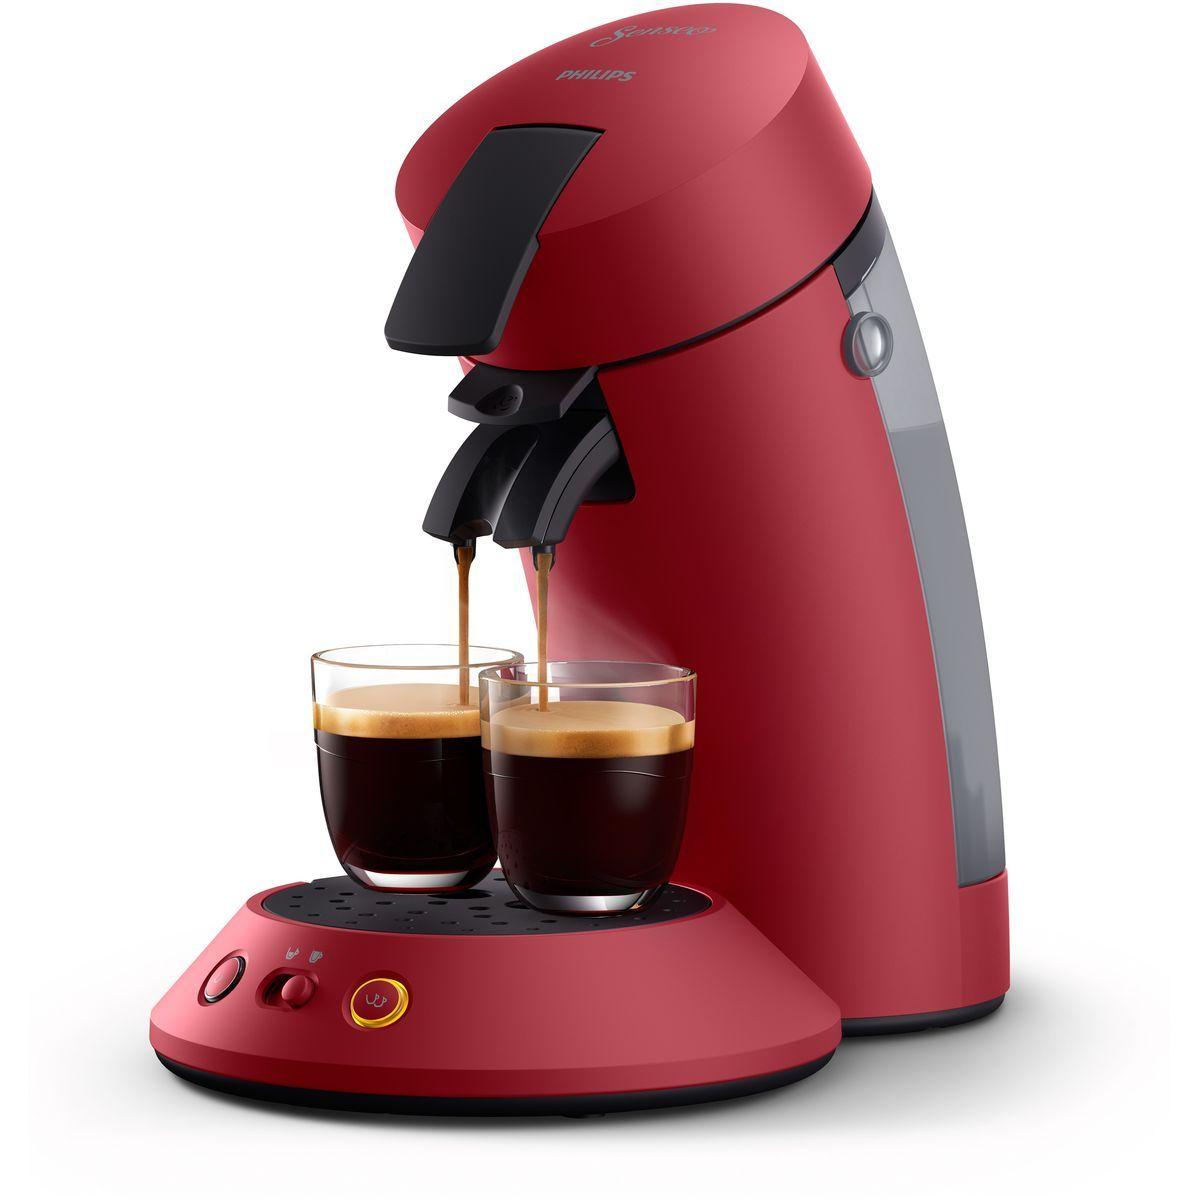 Machine à café à dosettes Senseo CSA210/91 - Rouge